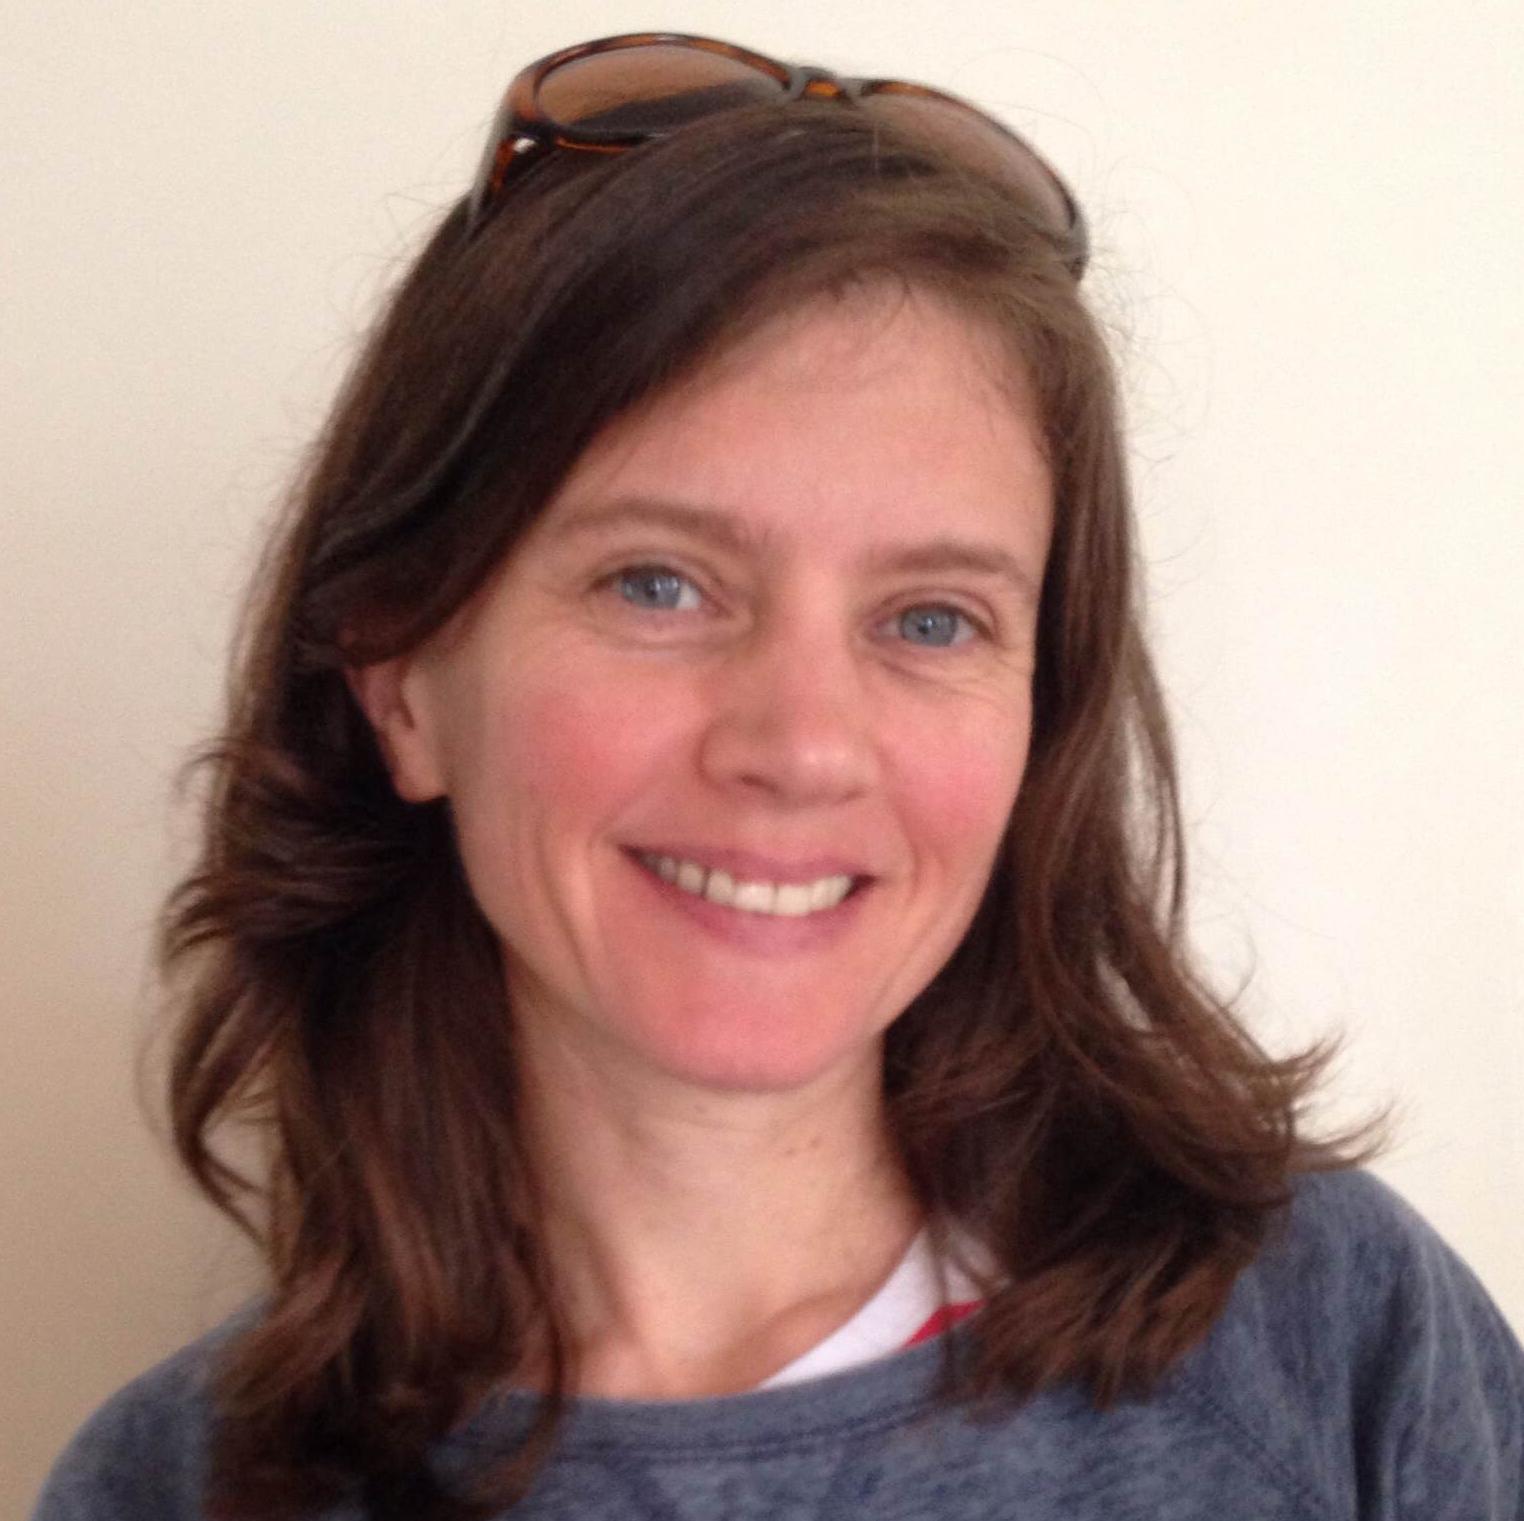 Meet MaWSIG: Behind the scenes – Deputy Publications Coordinator